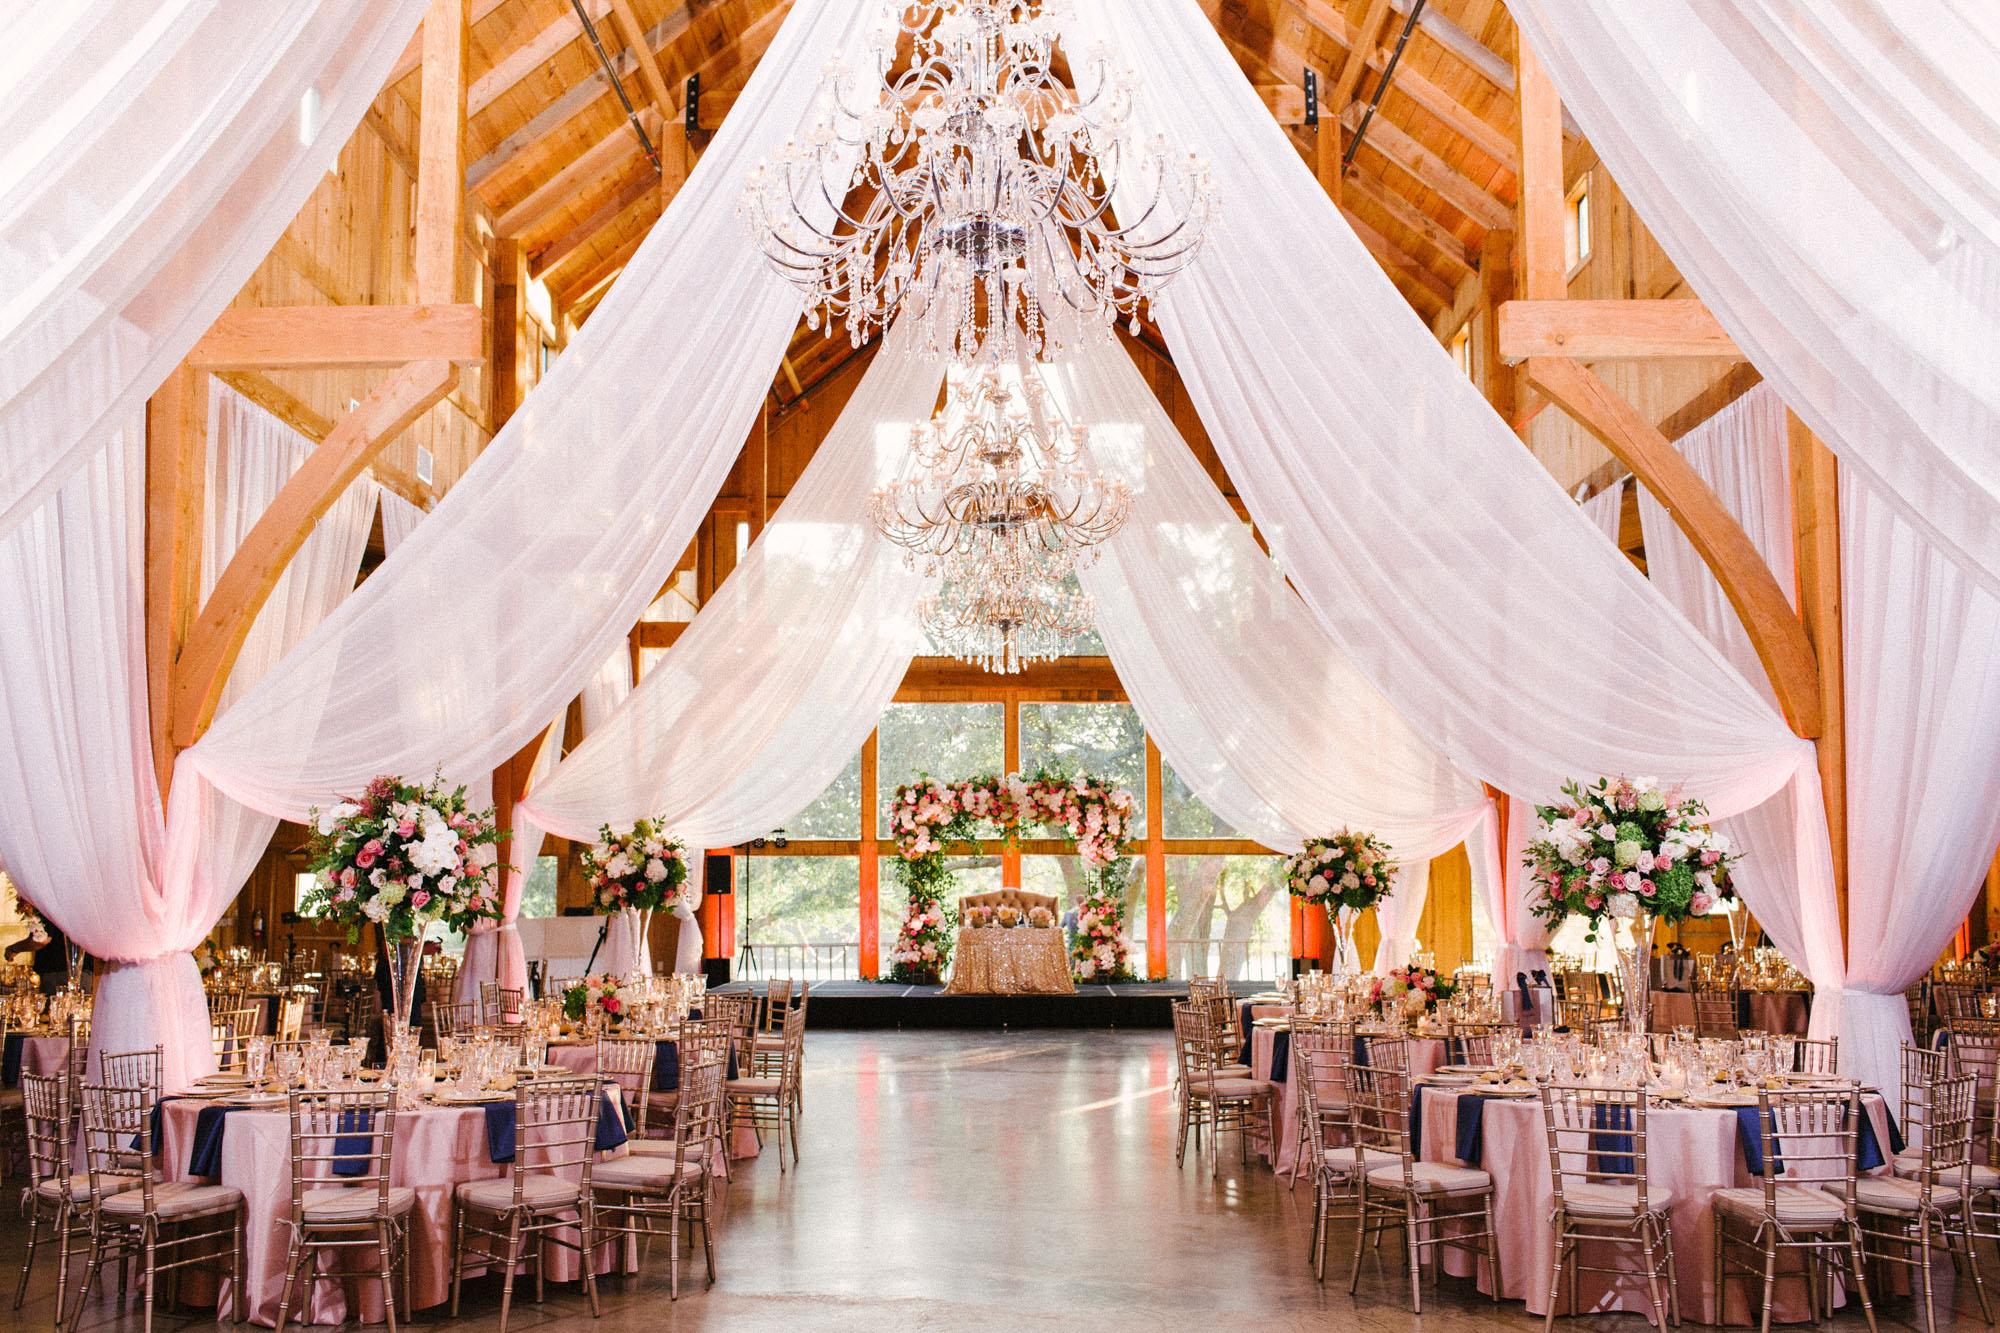 SM anna smith photography wedding photographer venue wedding planner-679.jpg